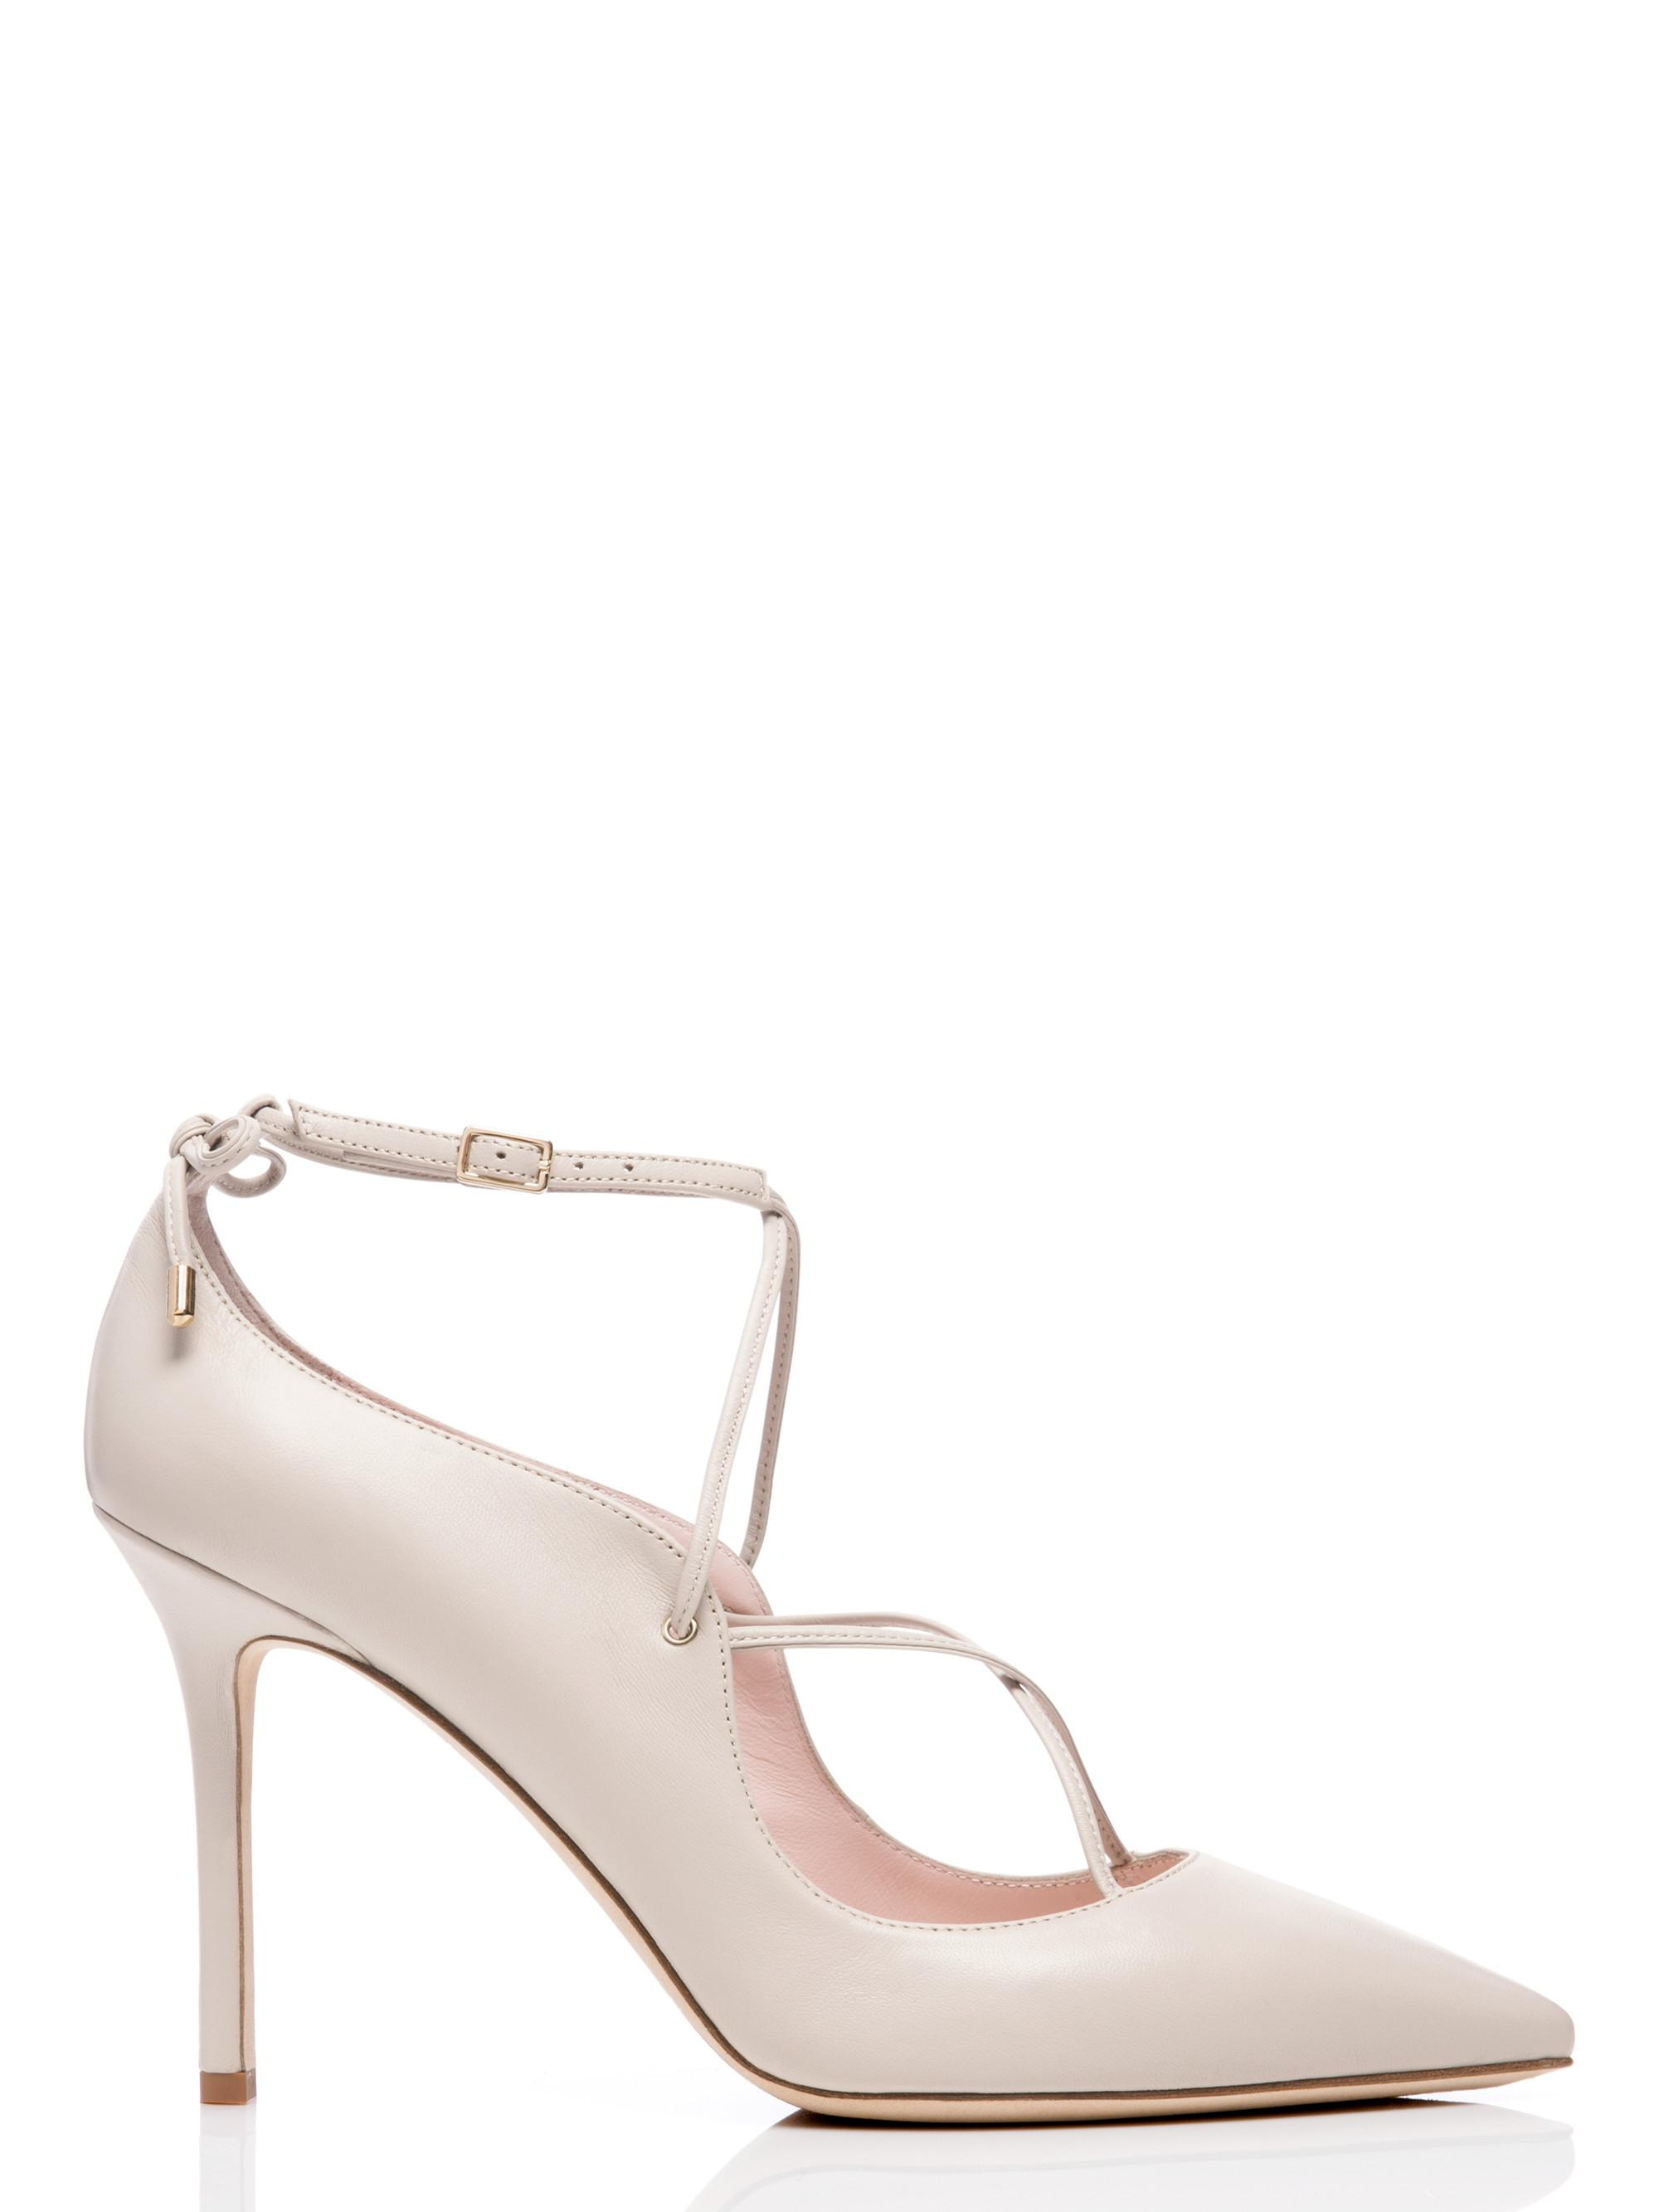 e829702a8f03 Lyst - Kate Spade Priscilla Heels in White